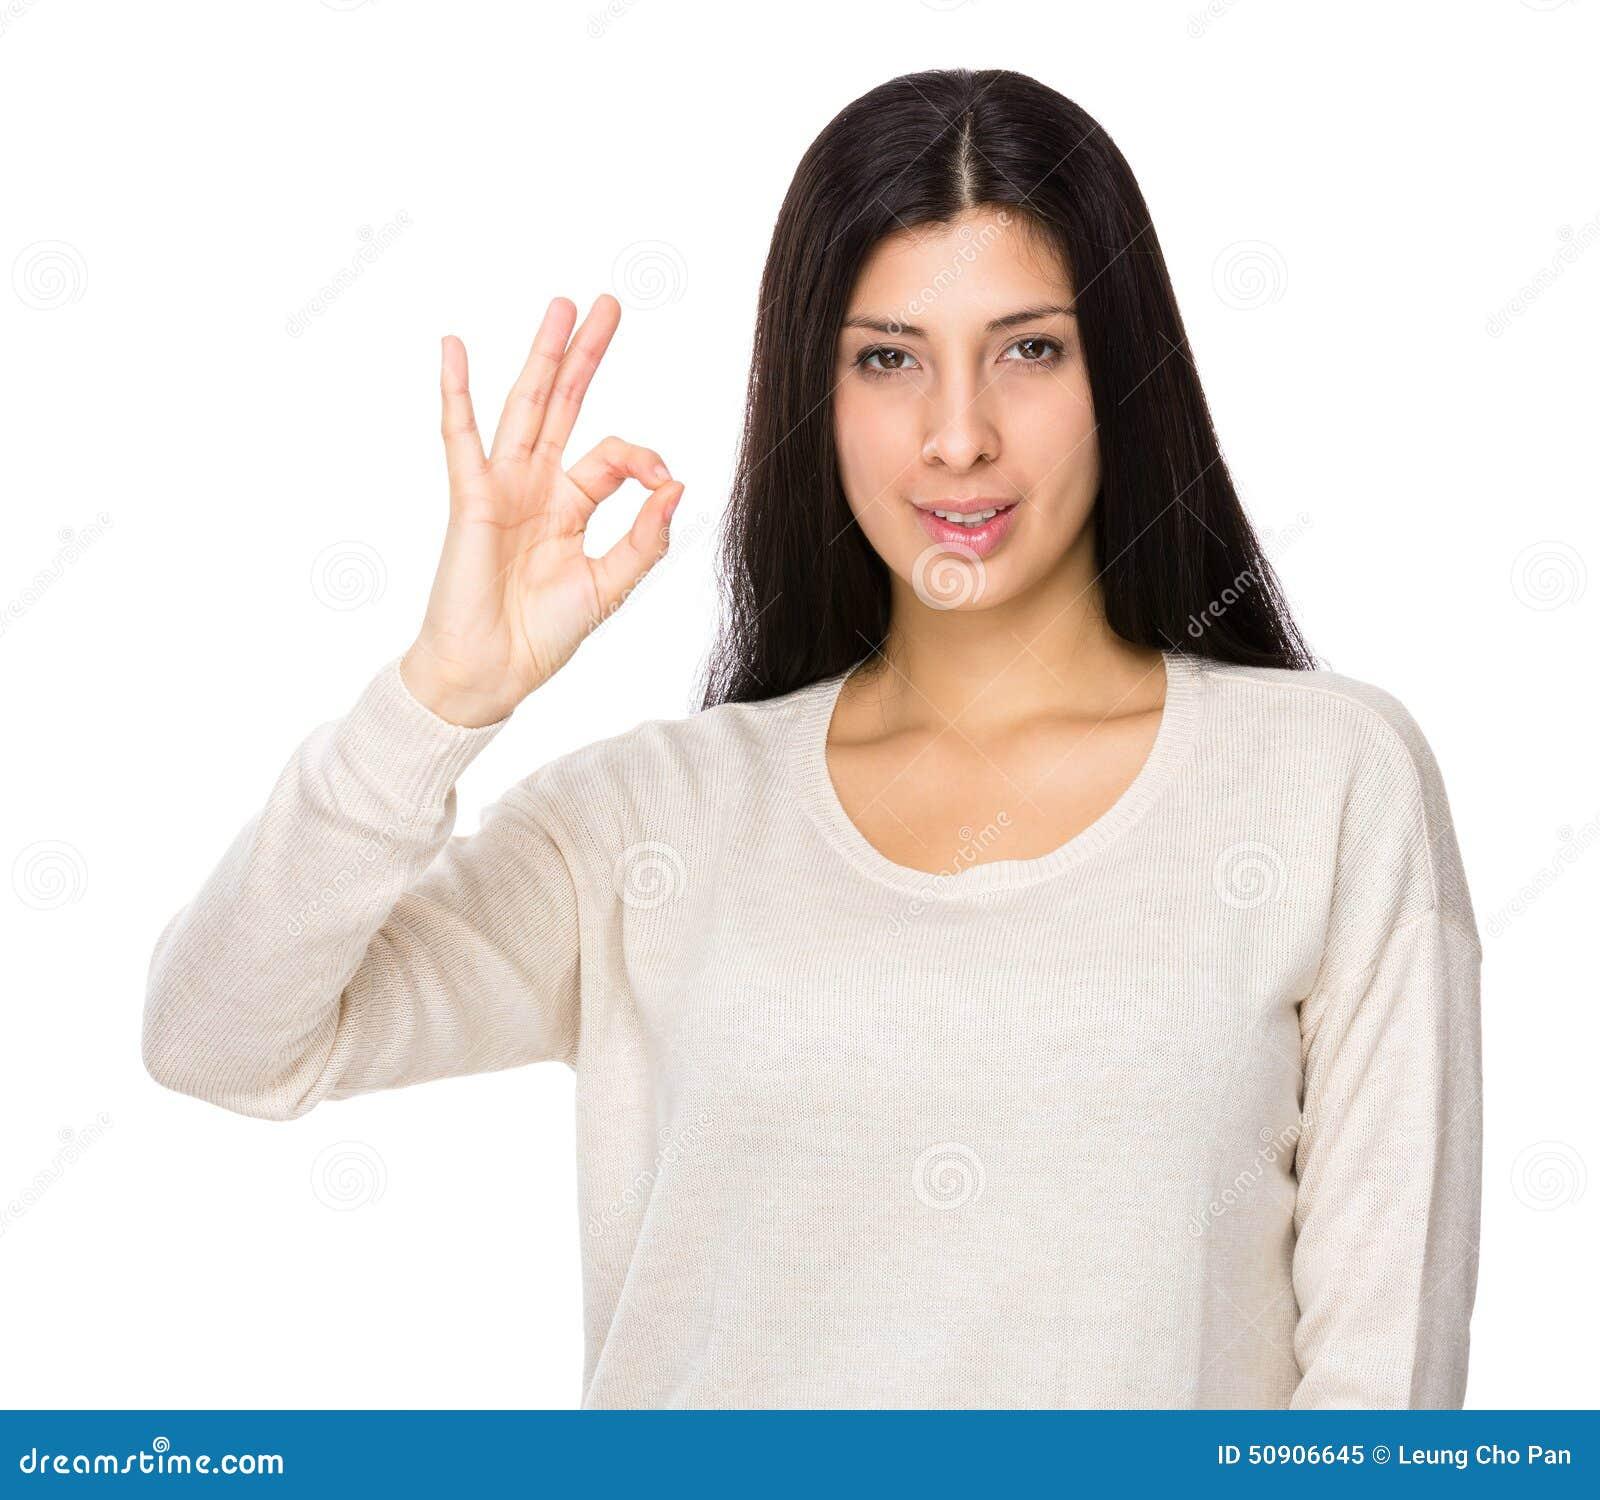 Cute Hispanic Girl Giving The OK Sign Stock Photo - Image